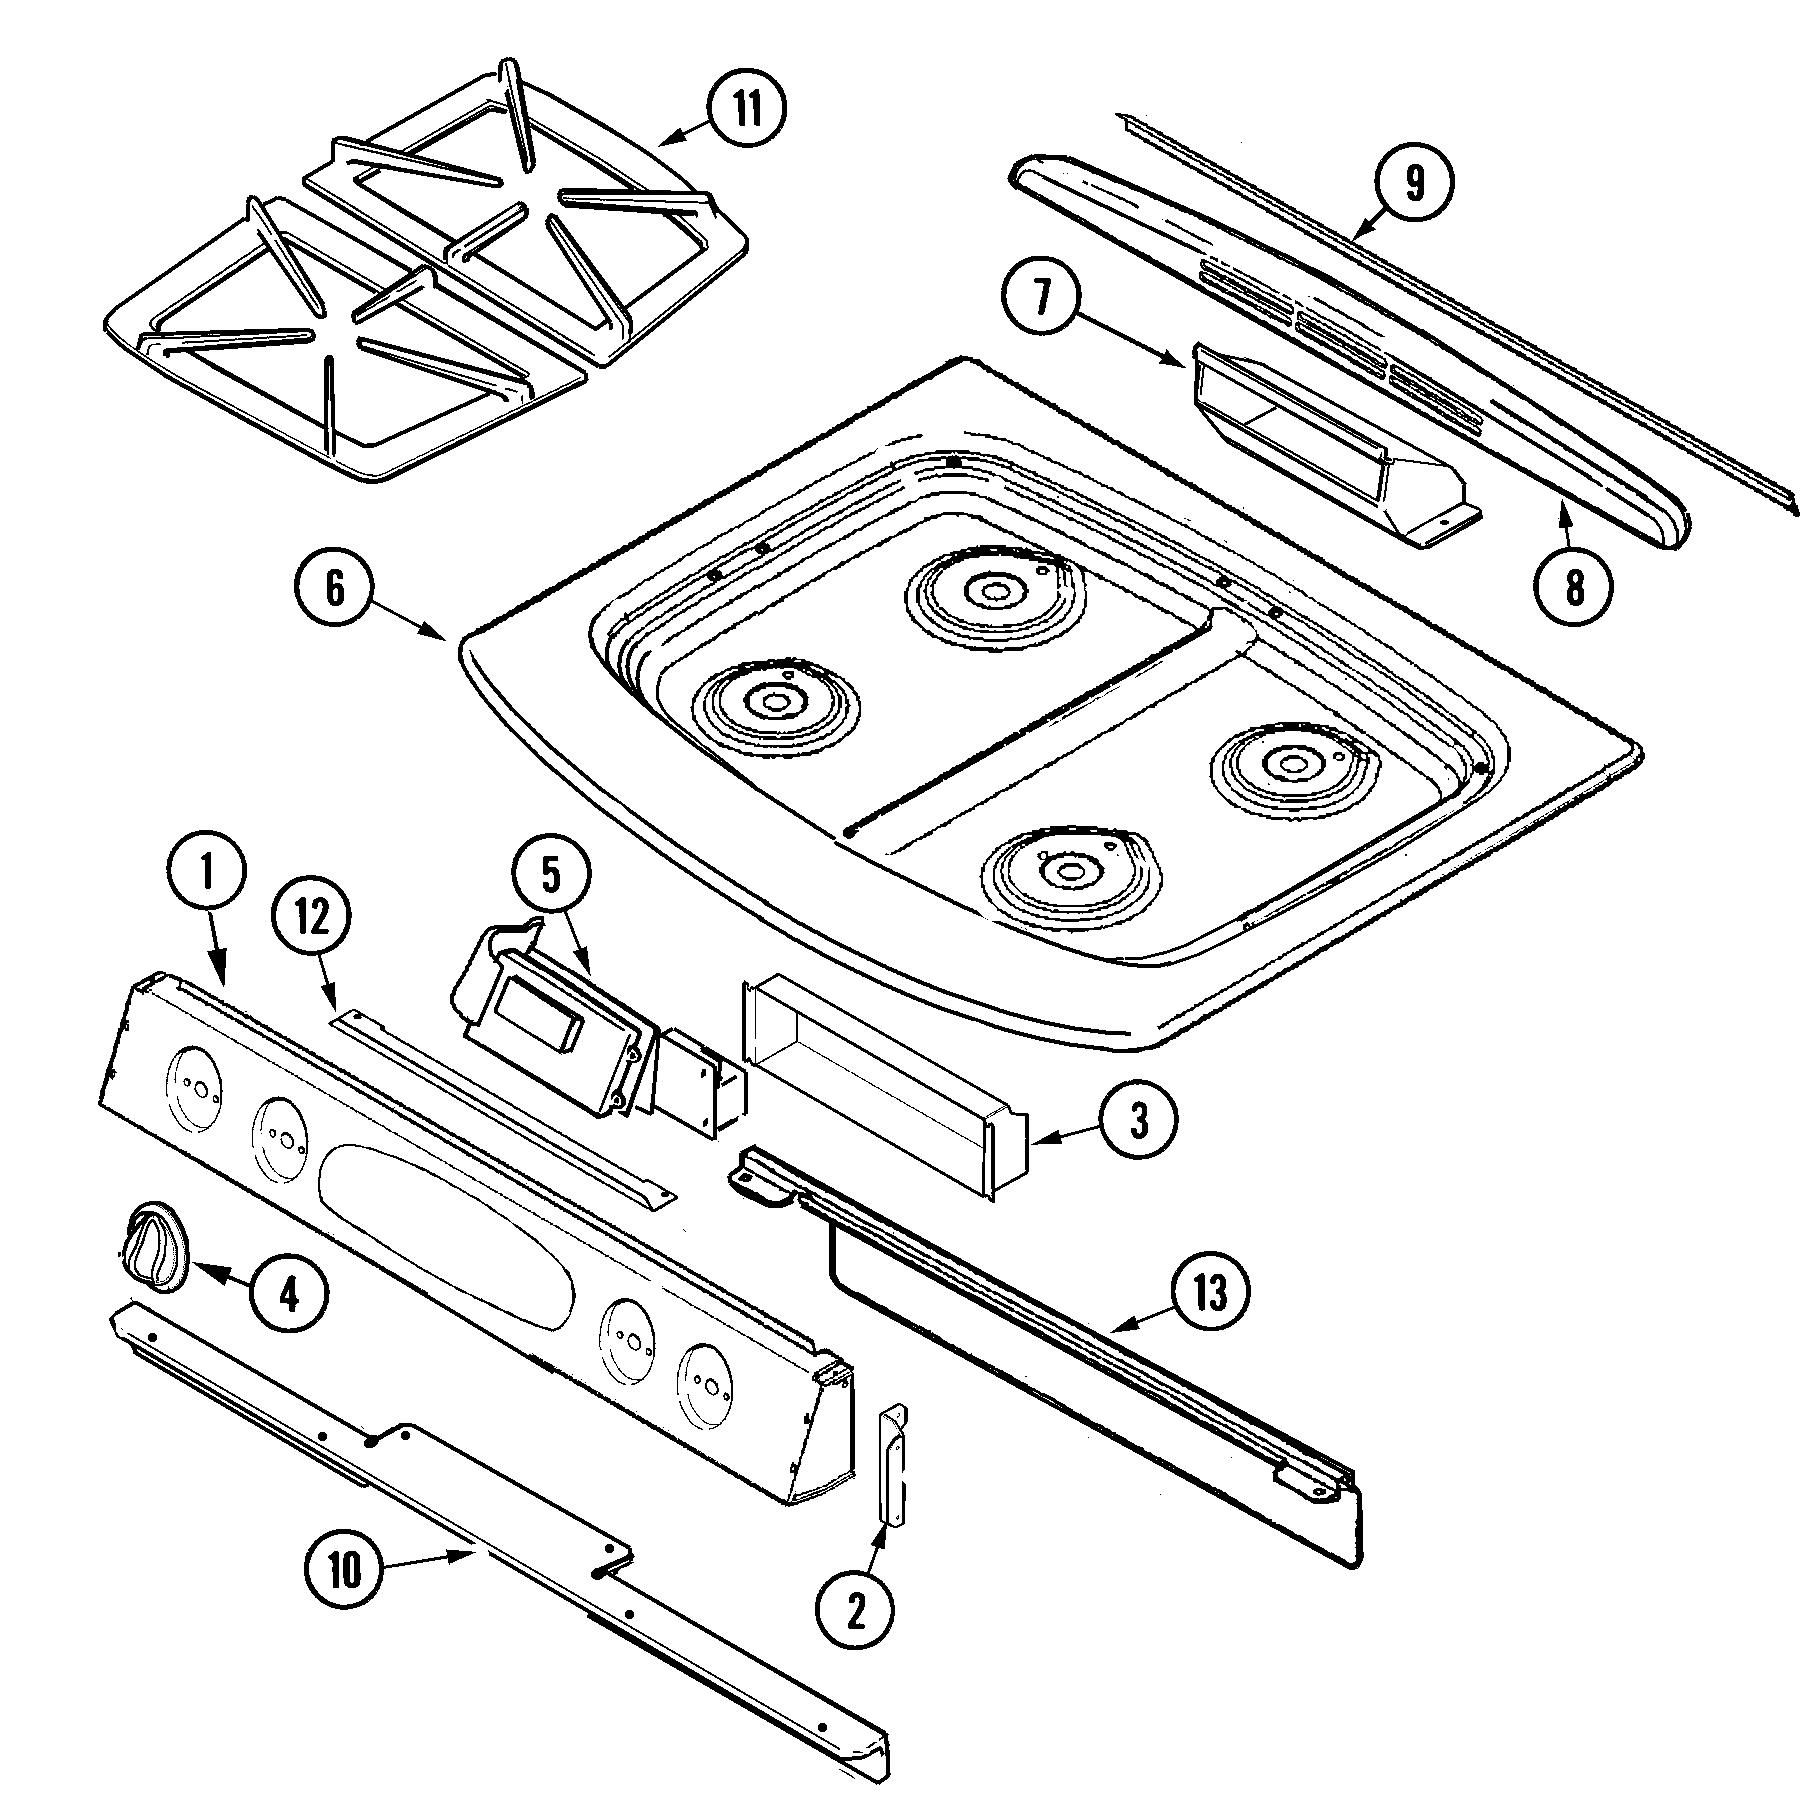 Gas Stove Gas Stove Parts Names